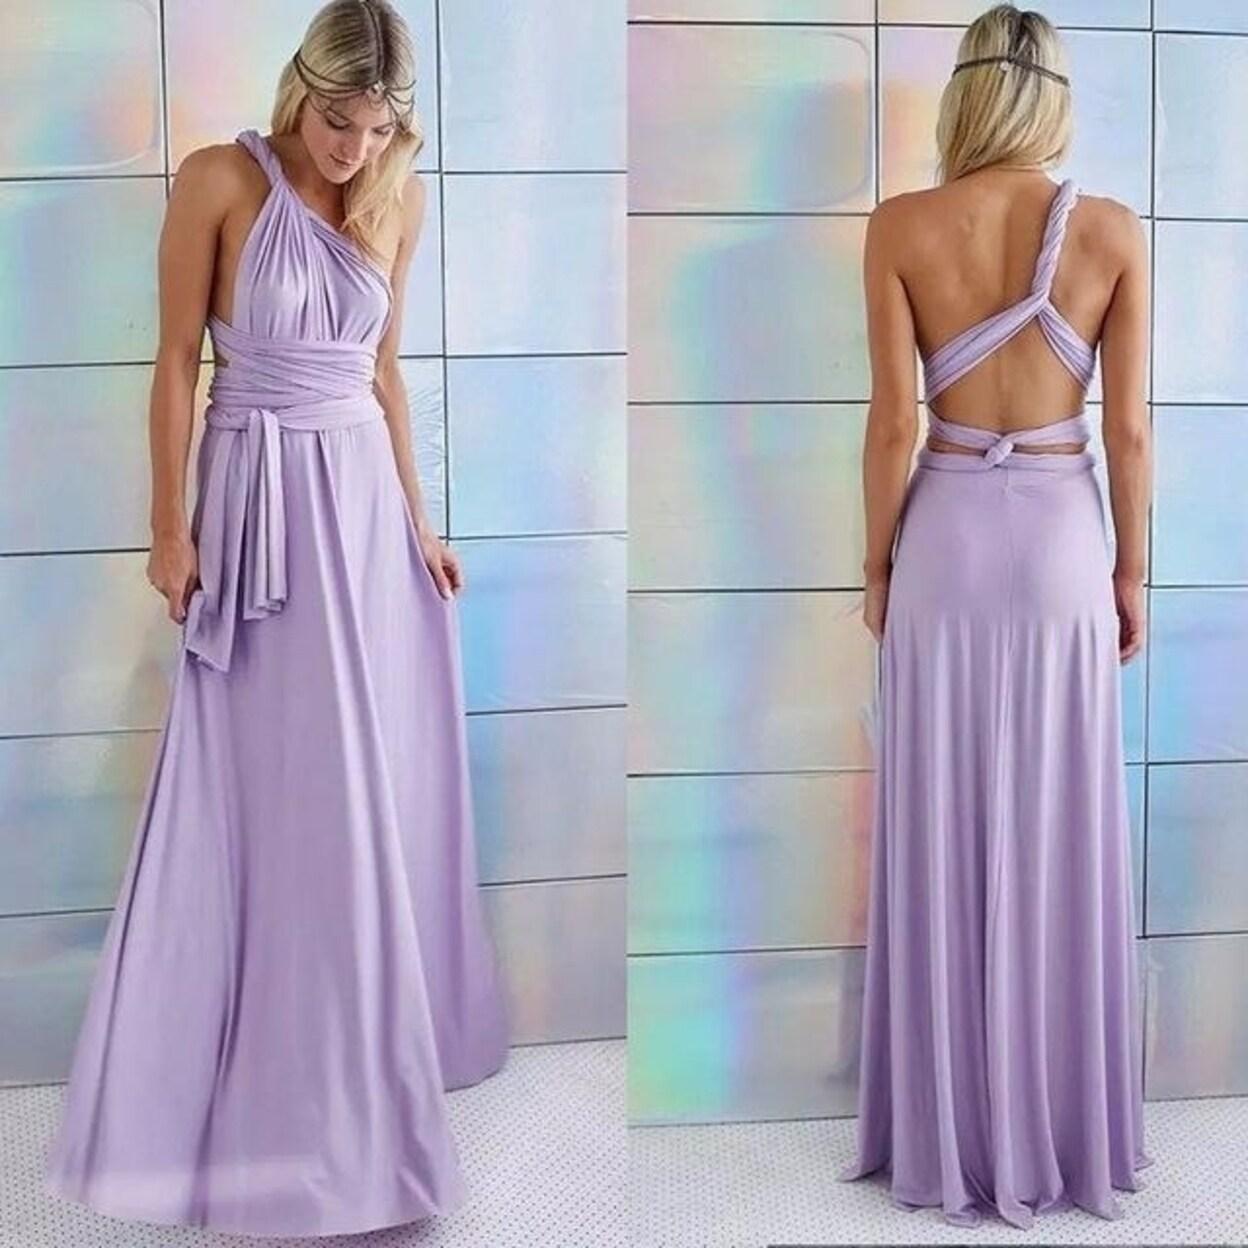 f459bfa668 Shop Women Long Summer Dress 2017 Europe Style Boho Bohemian Dresses Robe  Femme Casual Bandage Evening Prom Dinner Party Dress - Free Shipping Today  ...